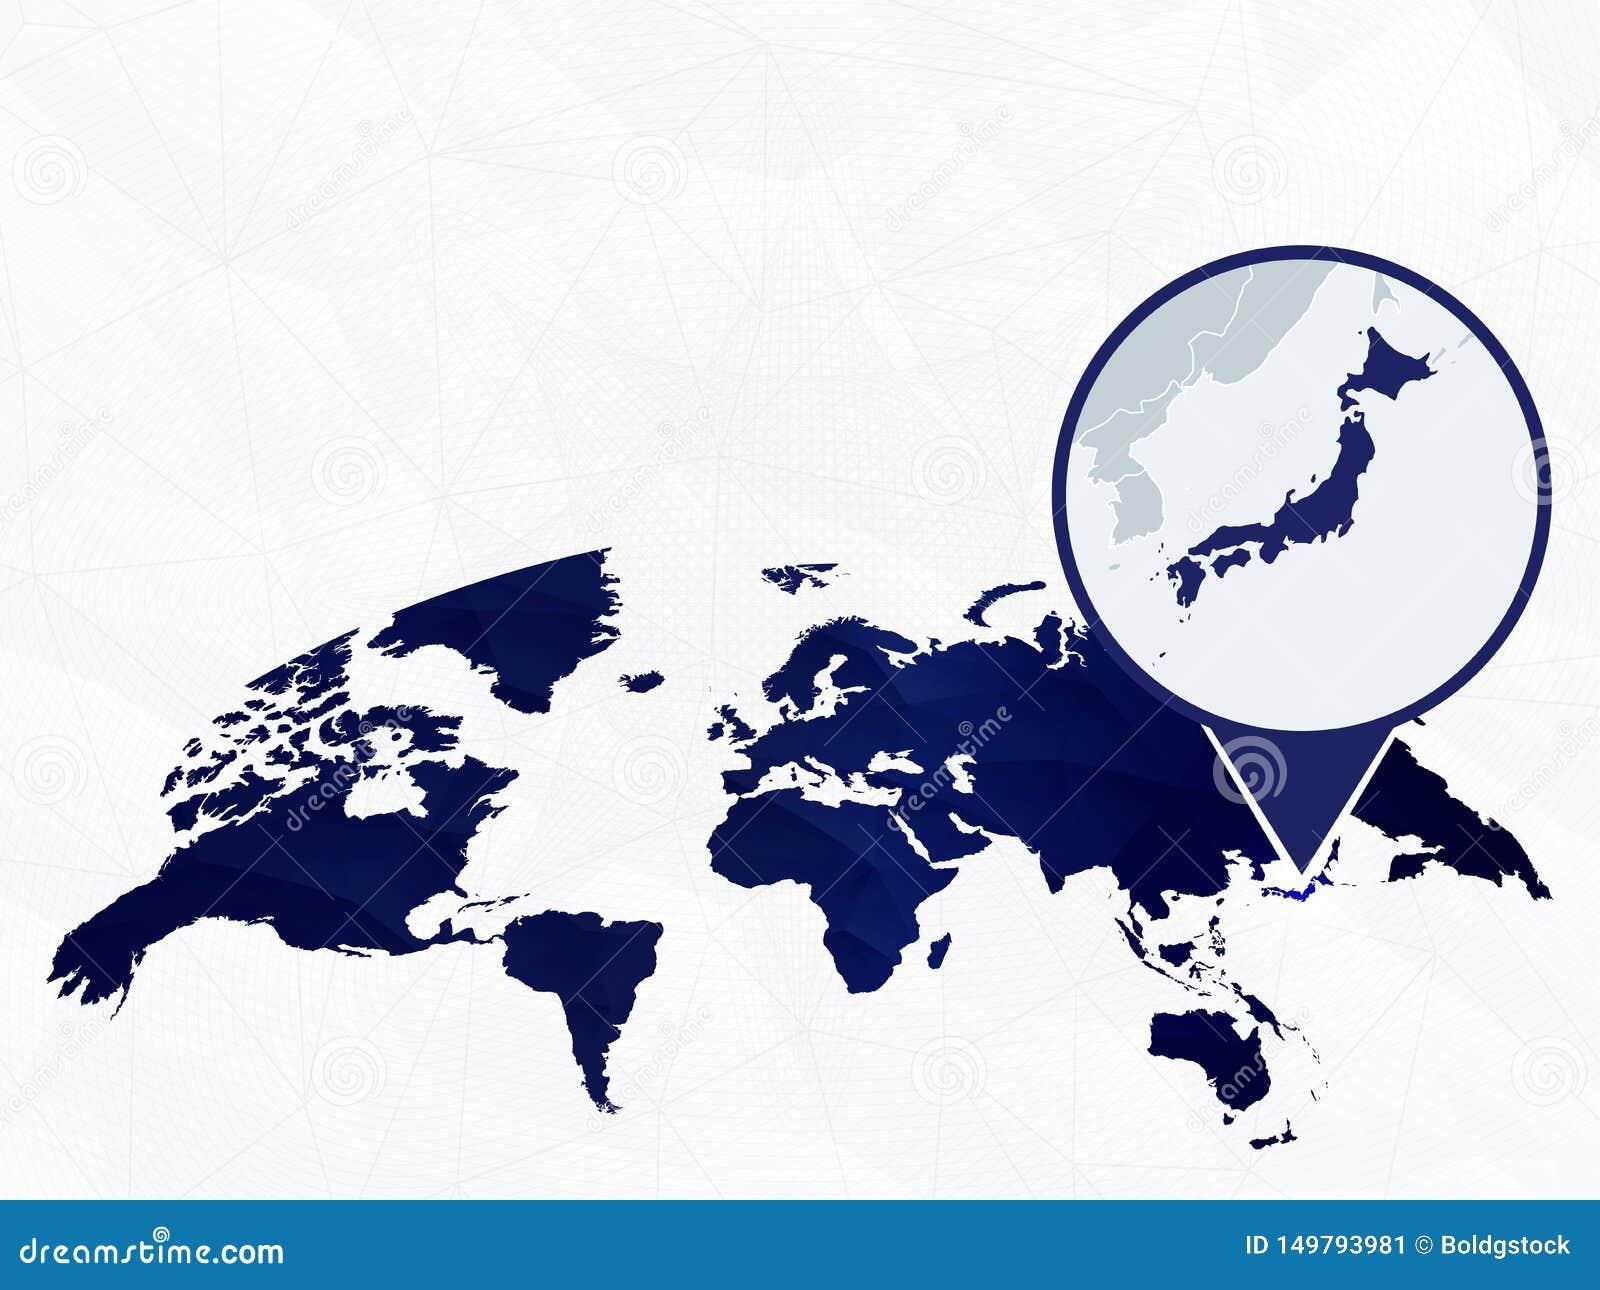 Japan Detailed Map Highlighted On Blue Rounded World Map Stock Vector Illustration Of Diamond Lighten 149793981